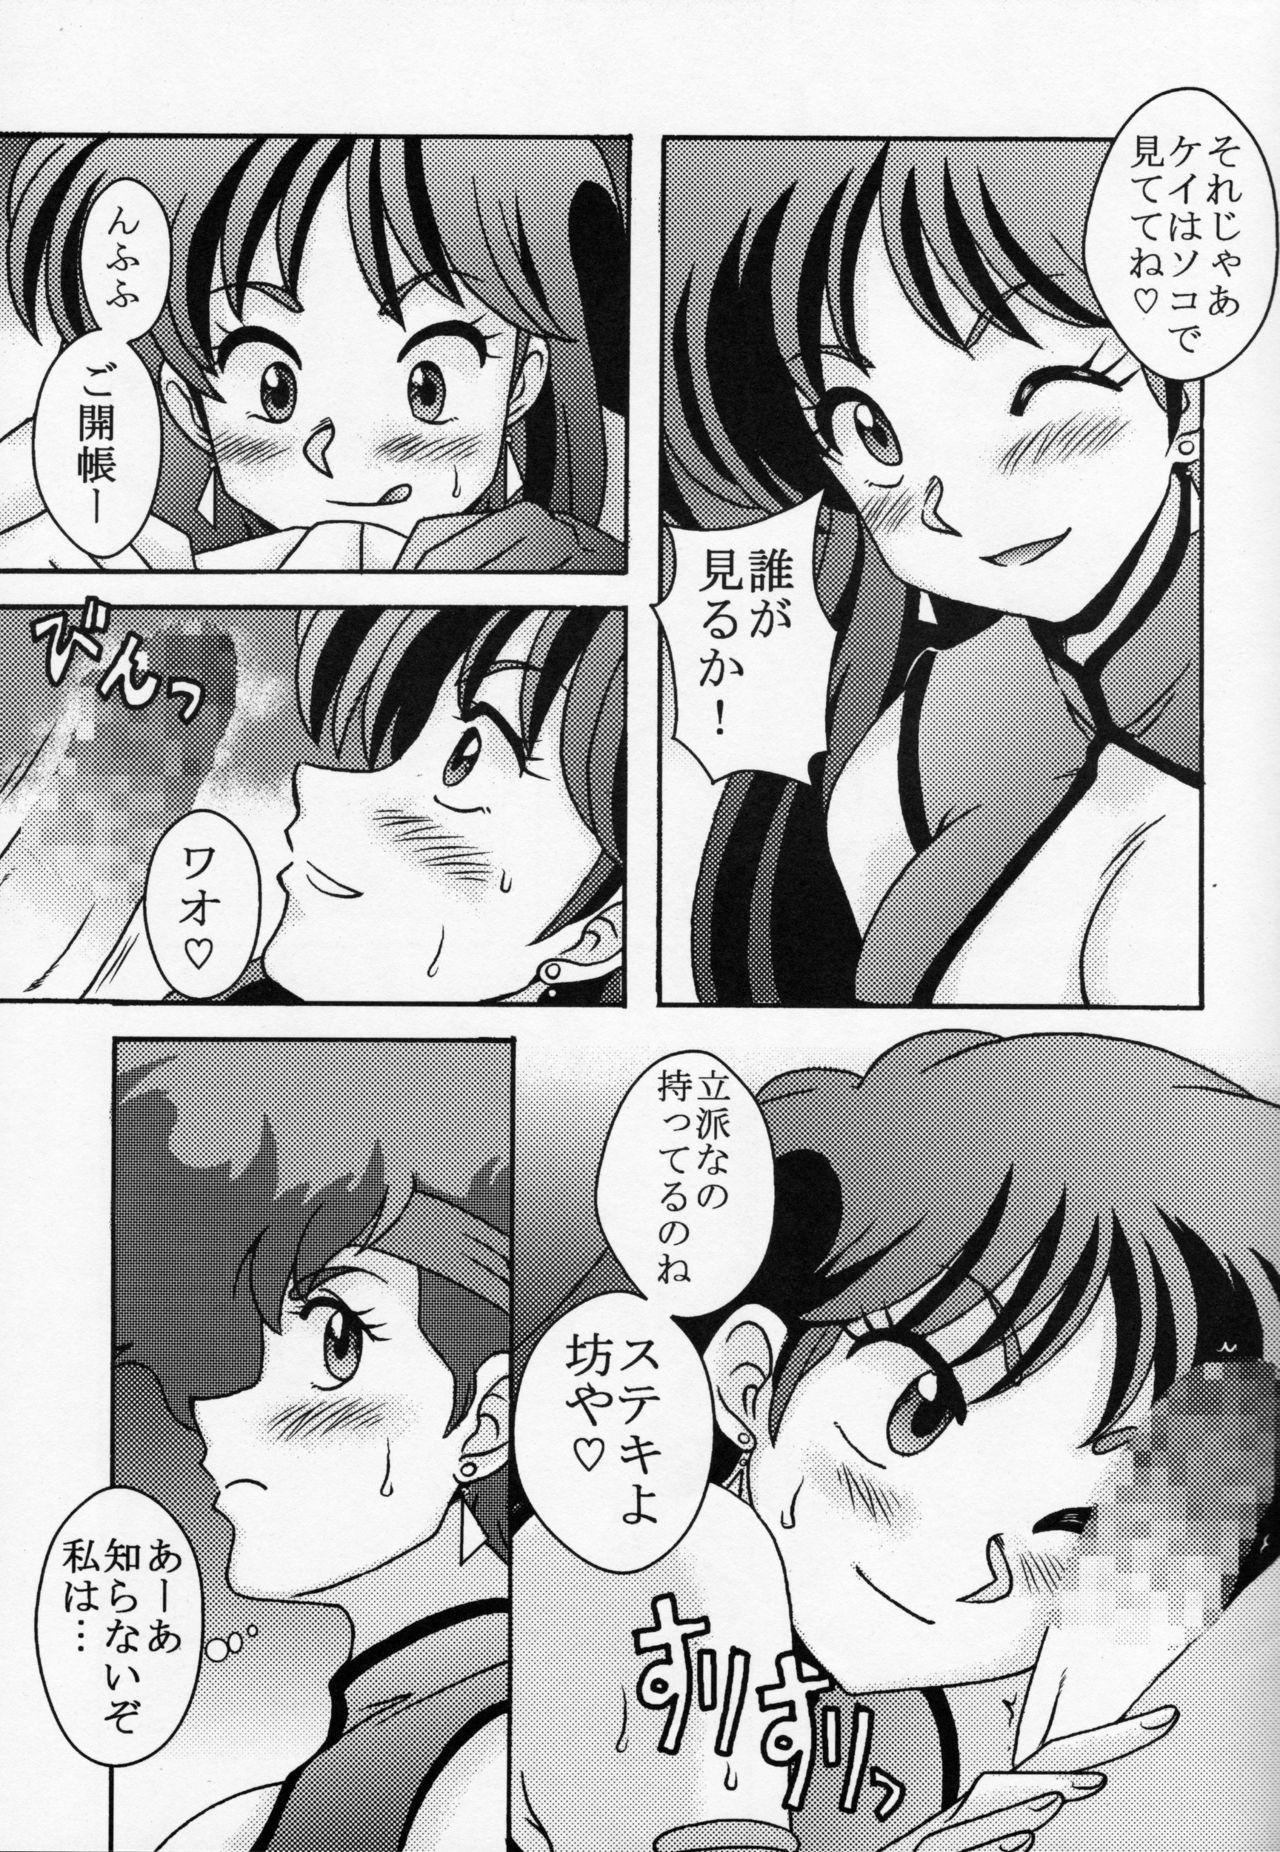 Kei to Yuri 5